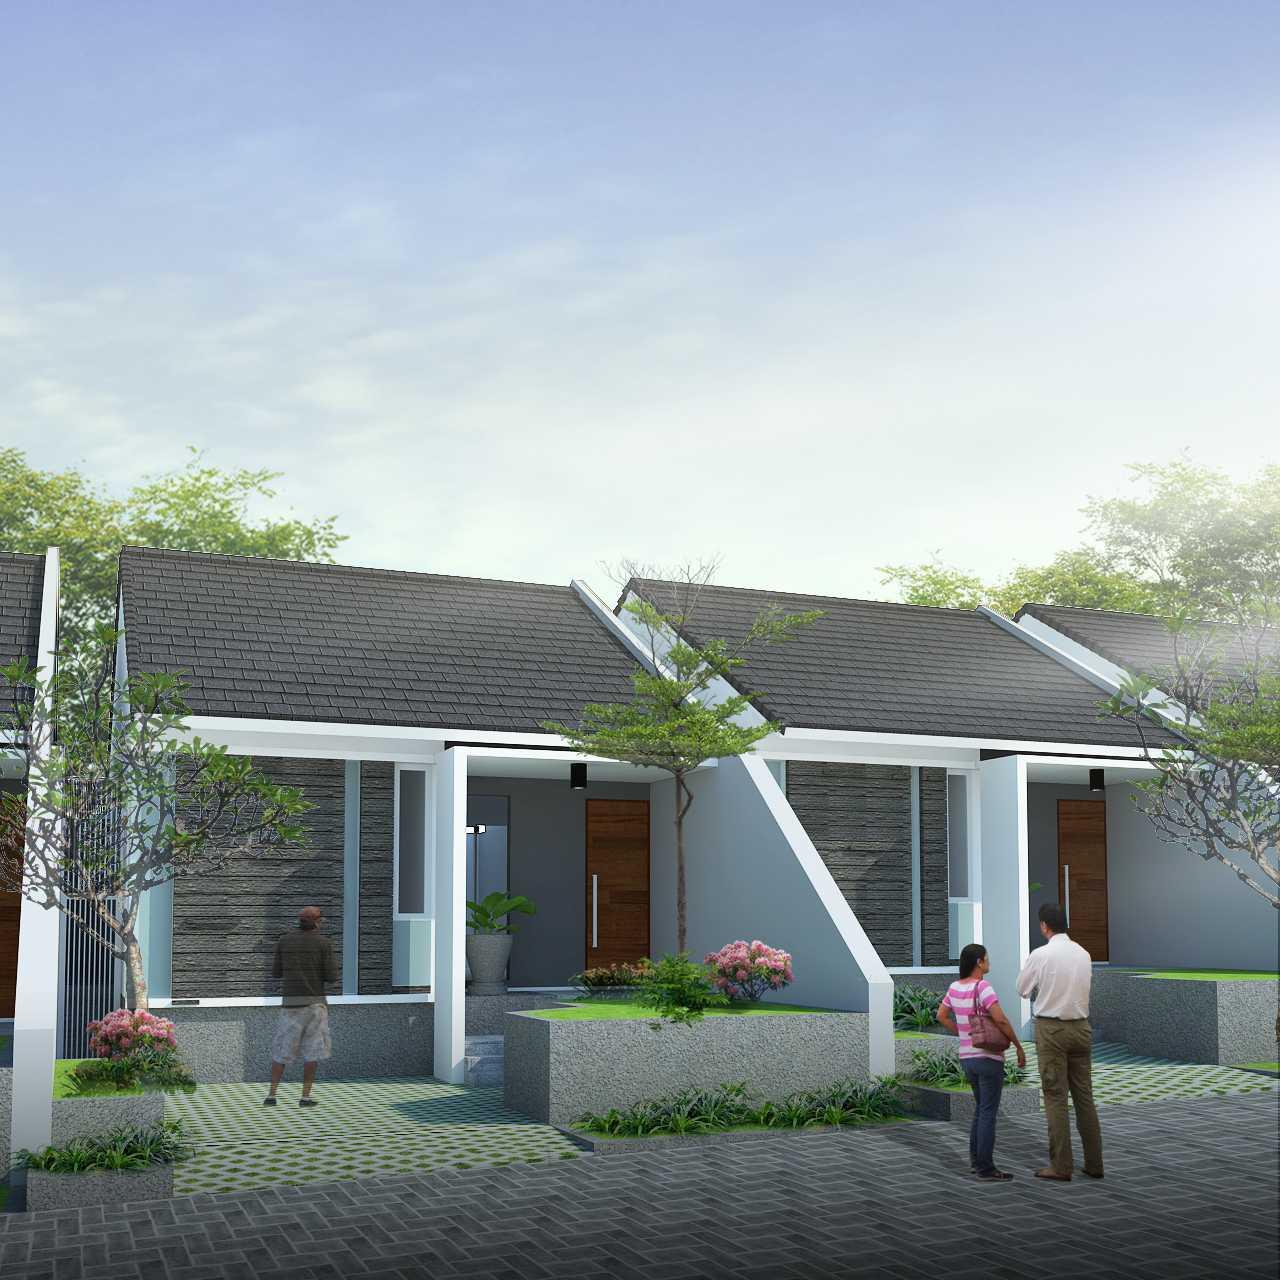 Ardharakhta Architect And Associates Bogorbaru Riverview Bogor, Jawa Barat, Indonesia Bogor, Jawa Barat, Indonesia Exterior View  <P>Type 120 A</p> 52085